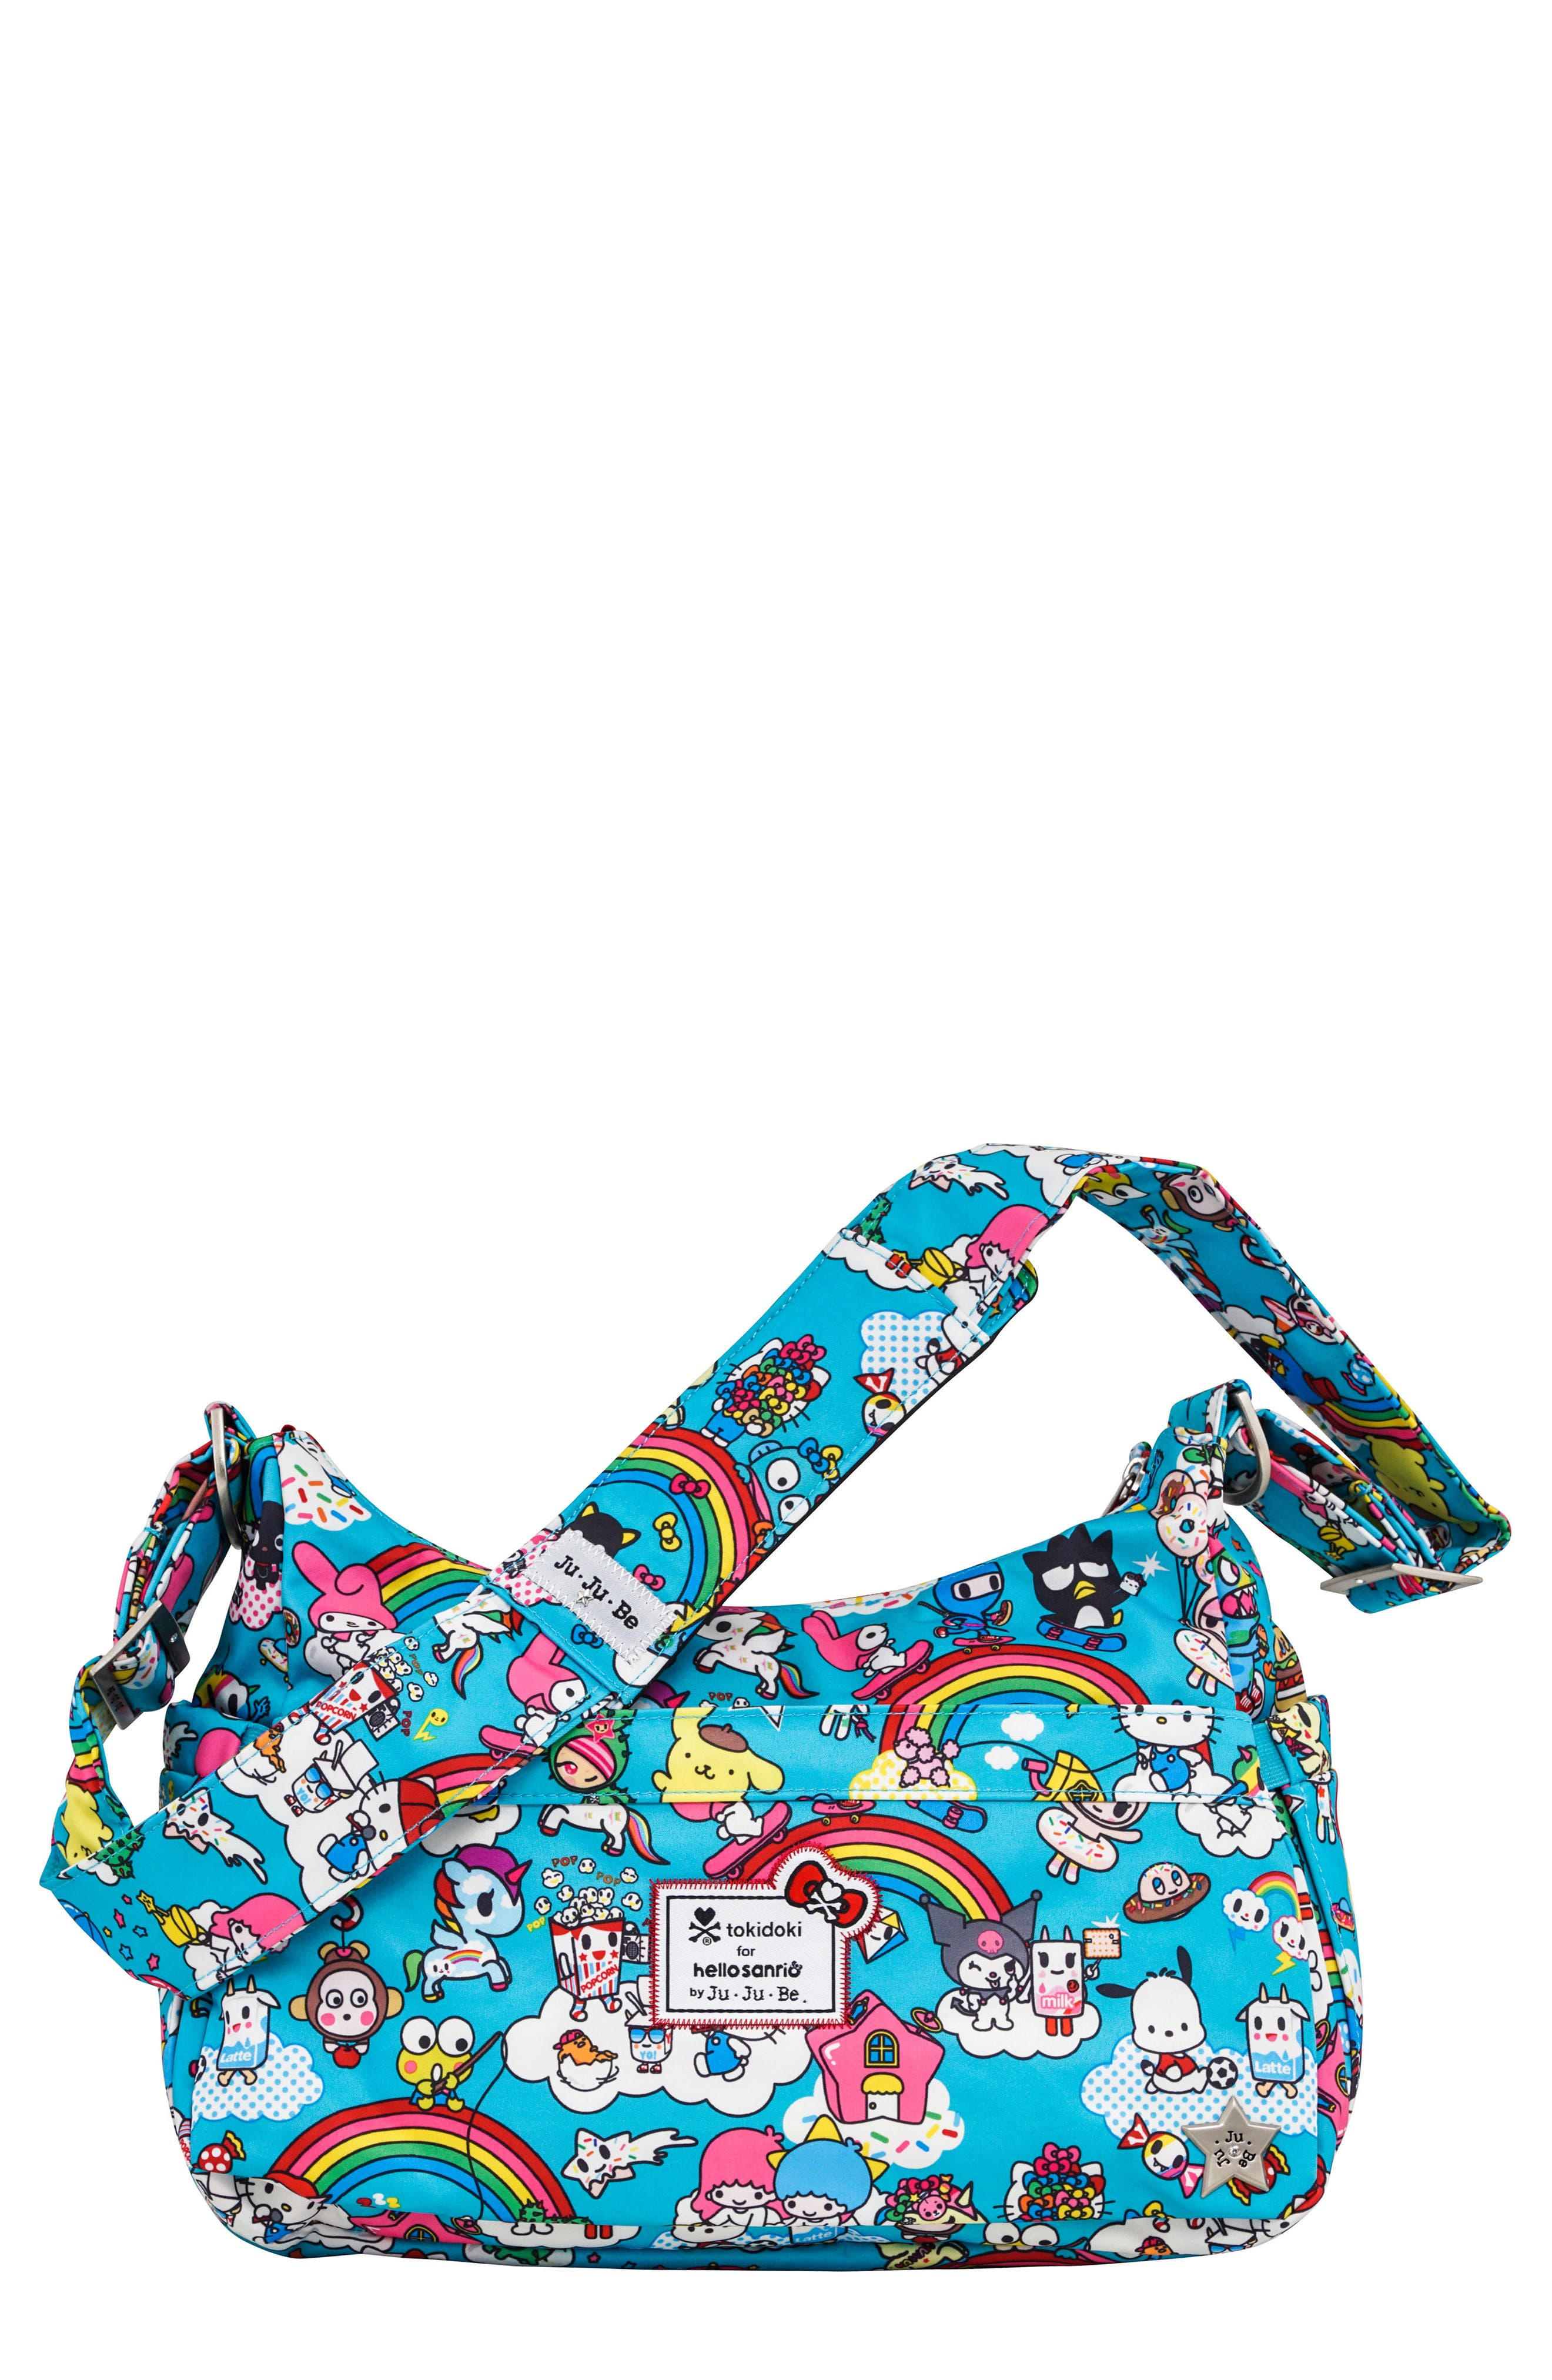 x tokidoki for Hello Sanrio Rainbow Dreams Be Hobo Diaper Bag,                         Main,                         color, Rainbow Dreams